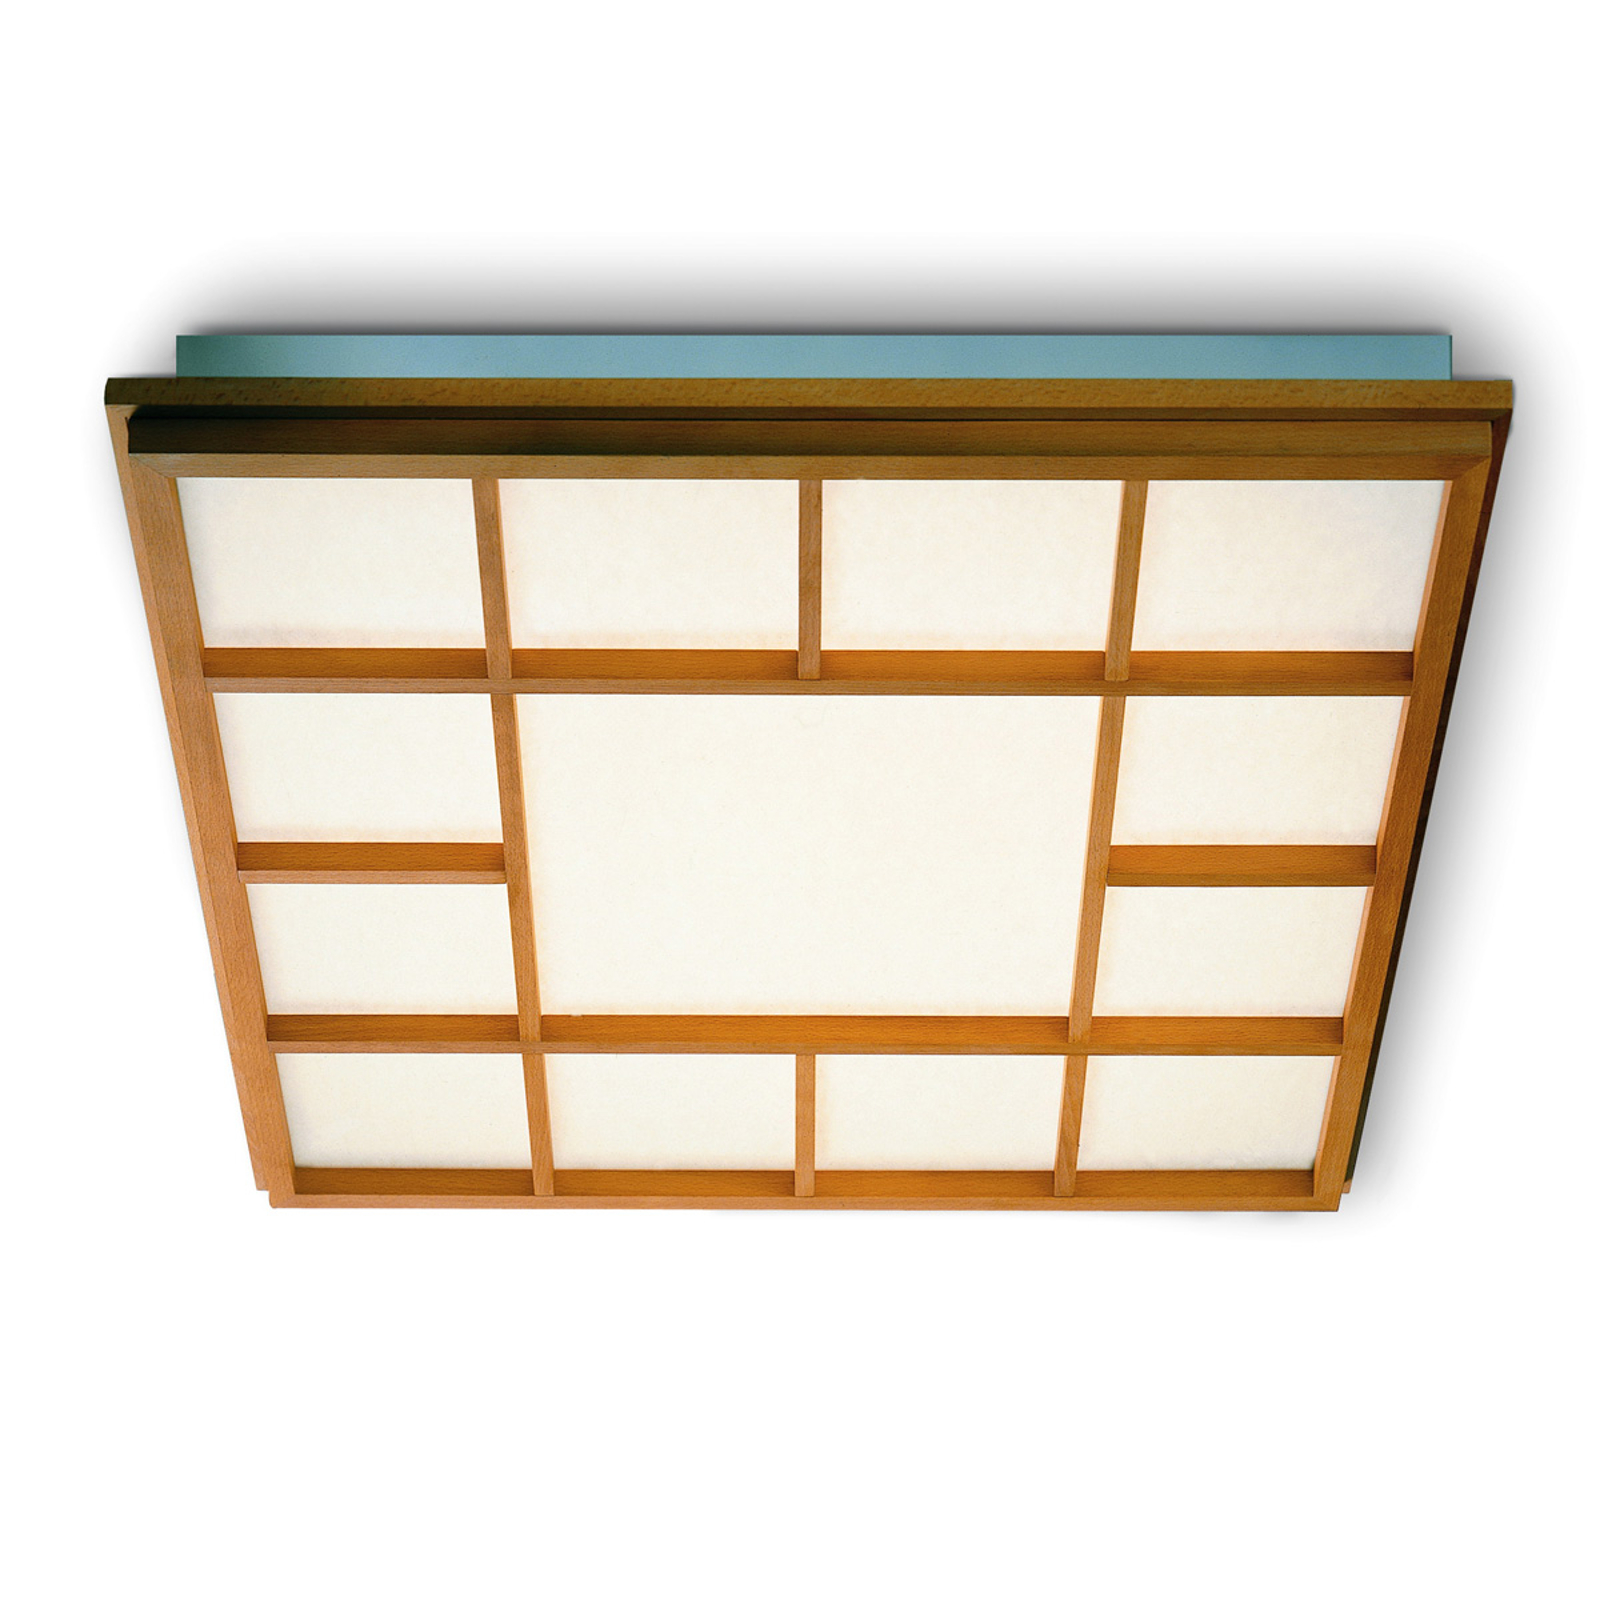 Vierkante LED plafondlamp Kioto 13 beuken